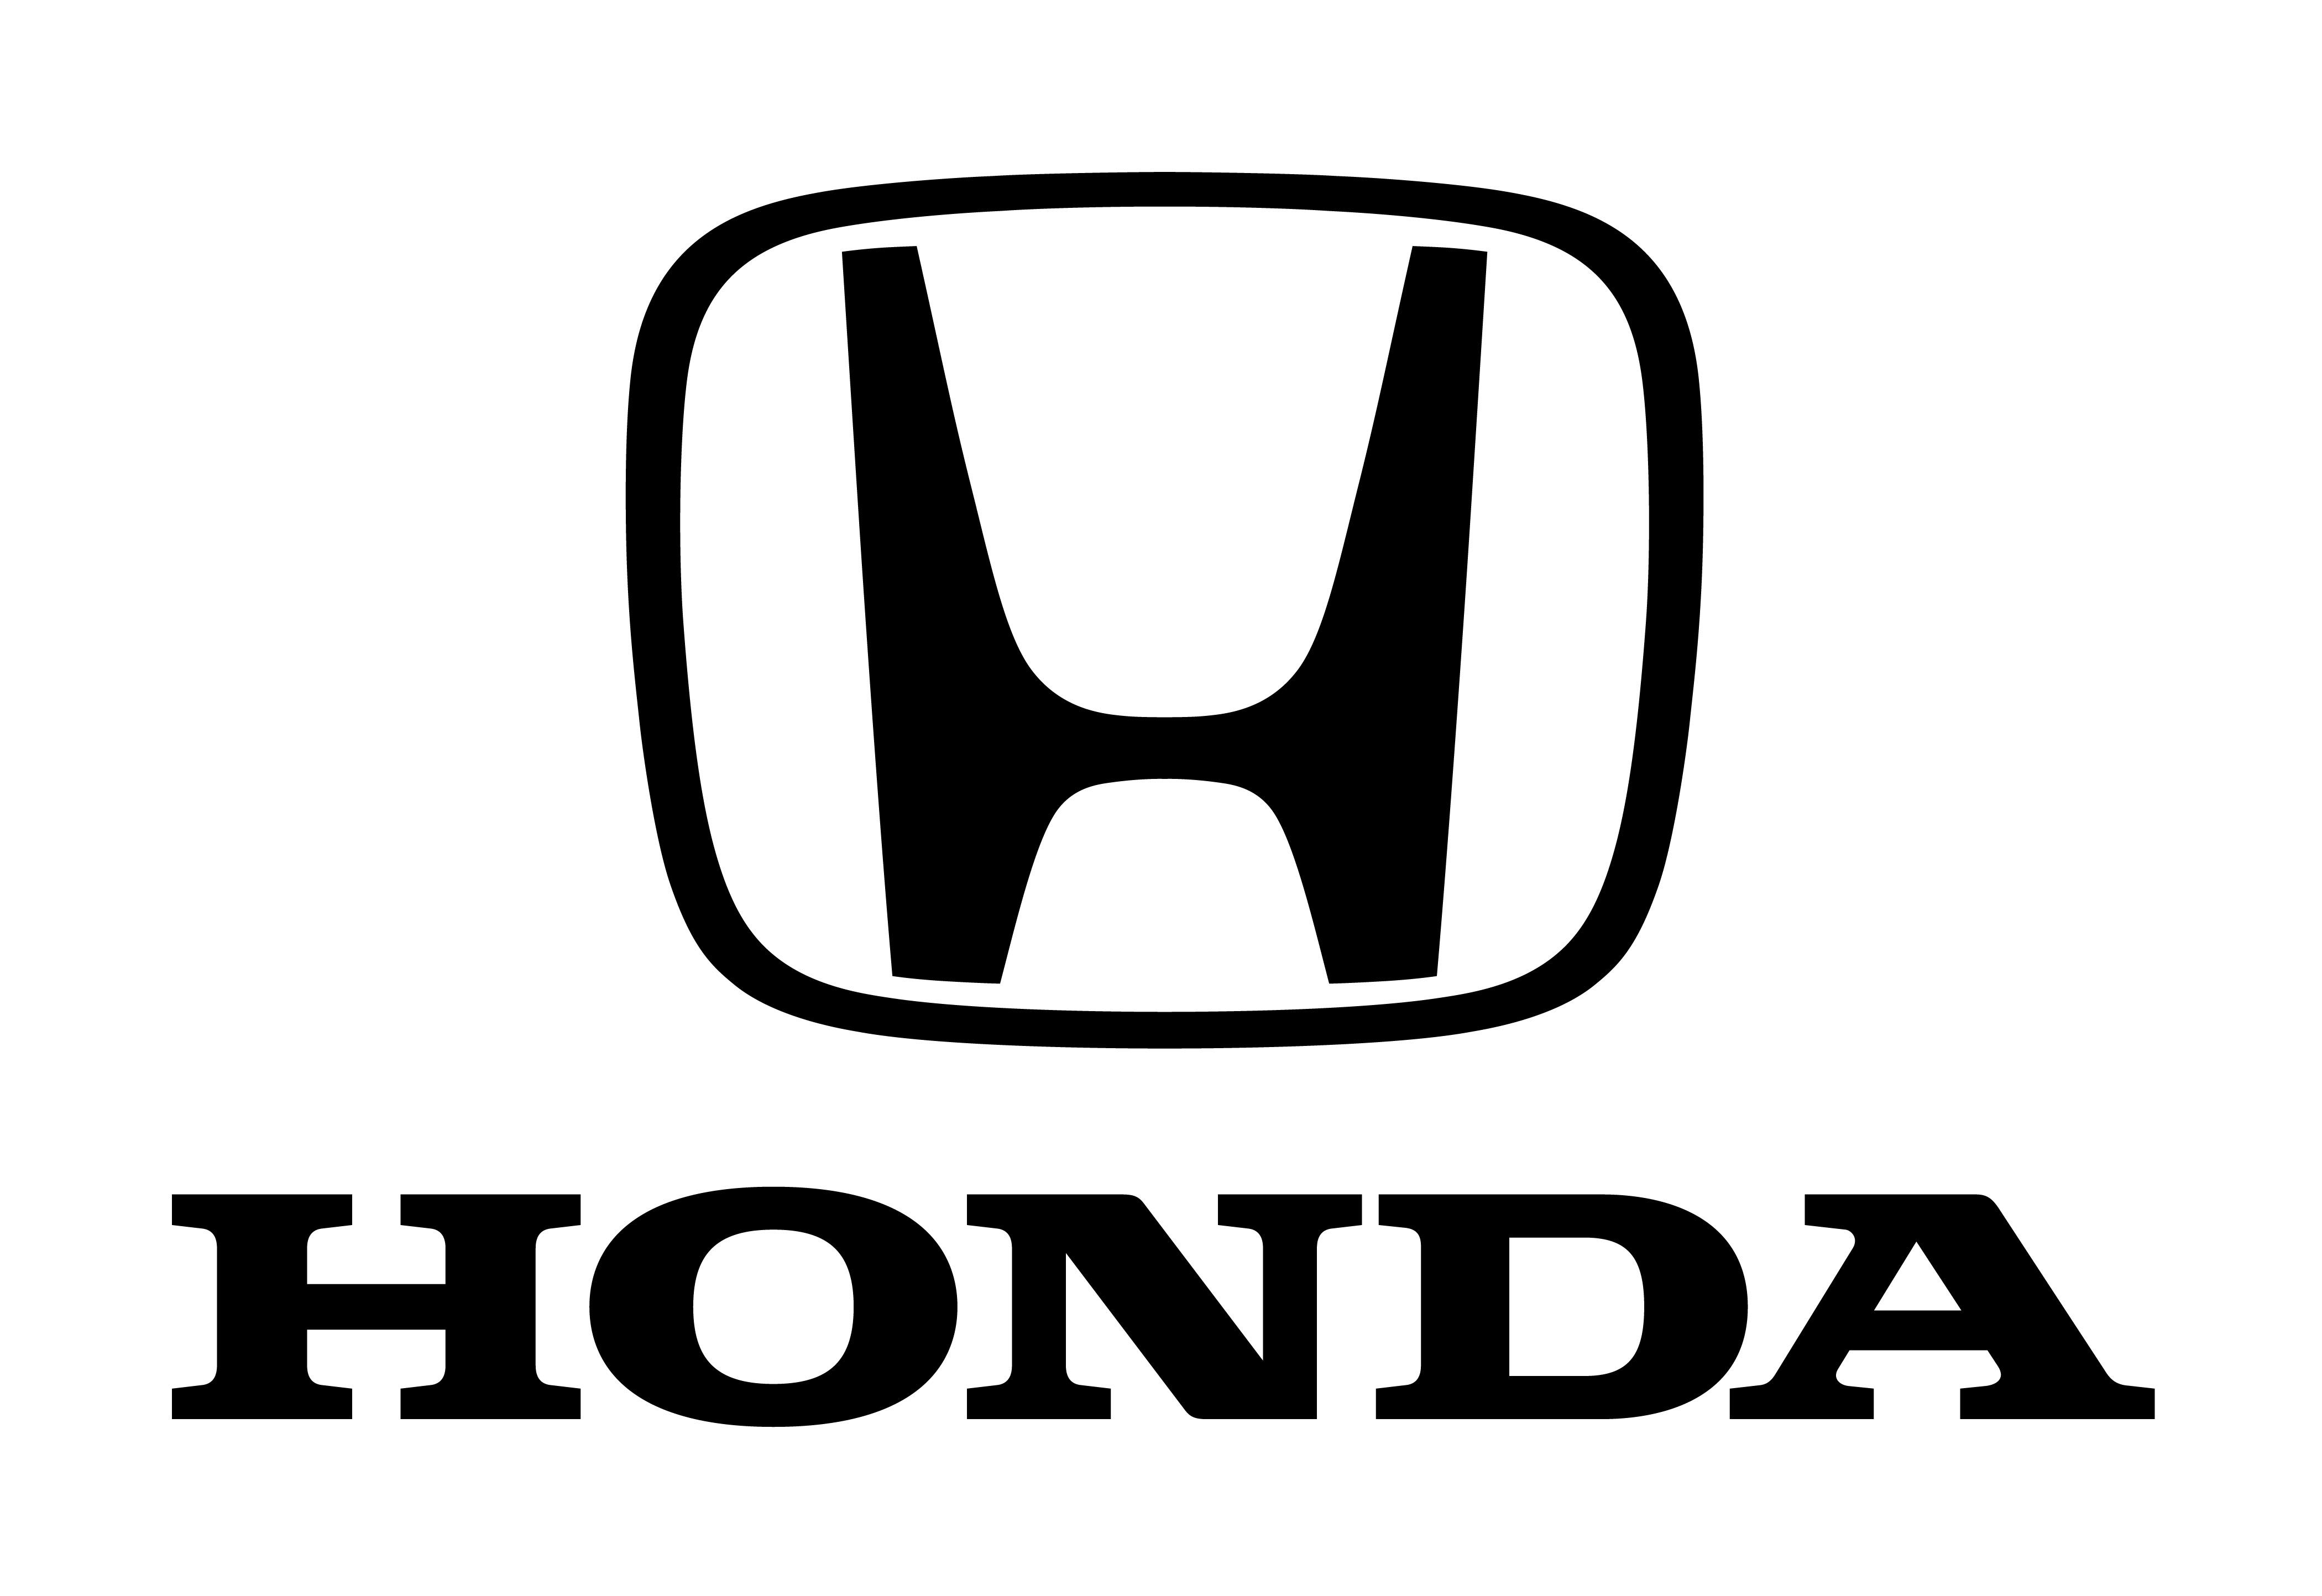 Honda logo clipart.